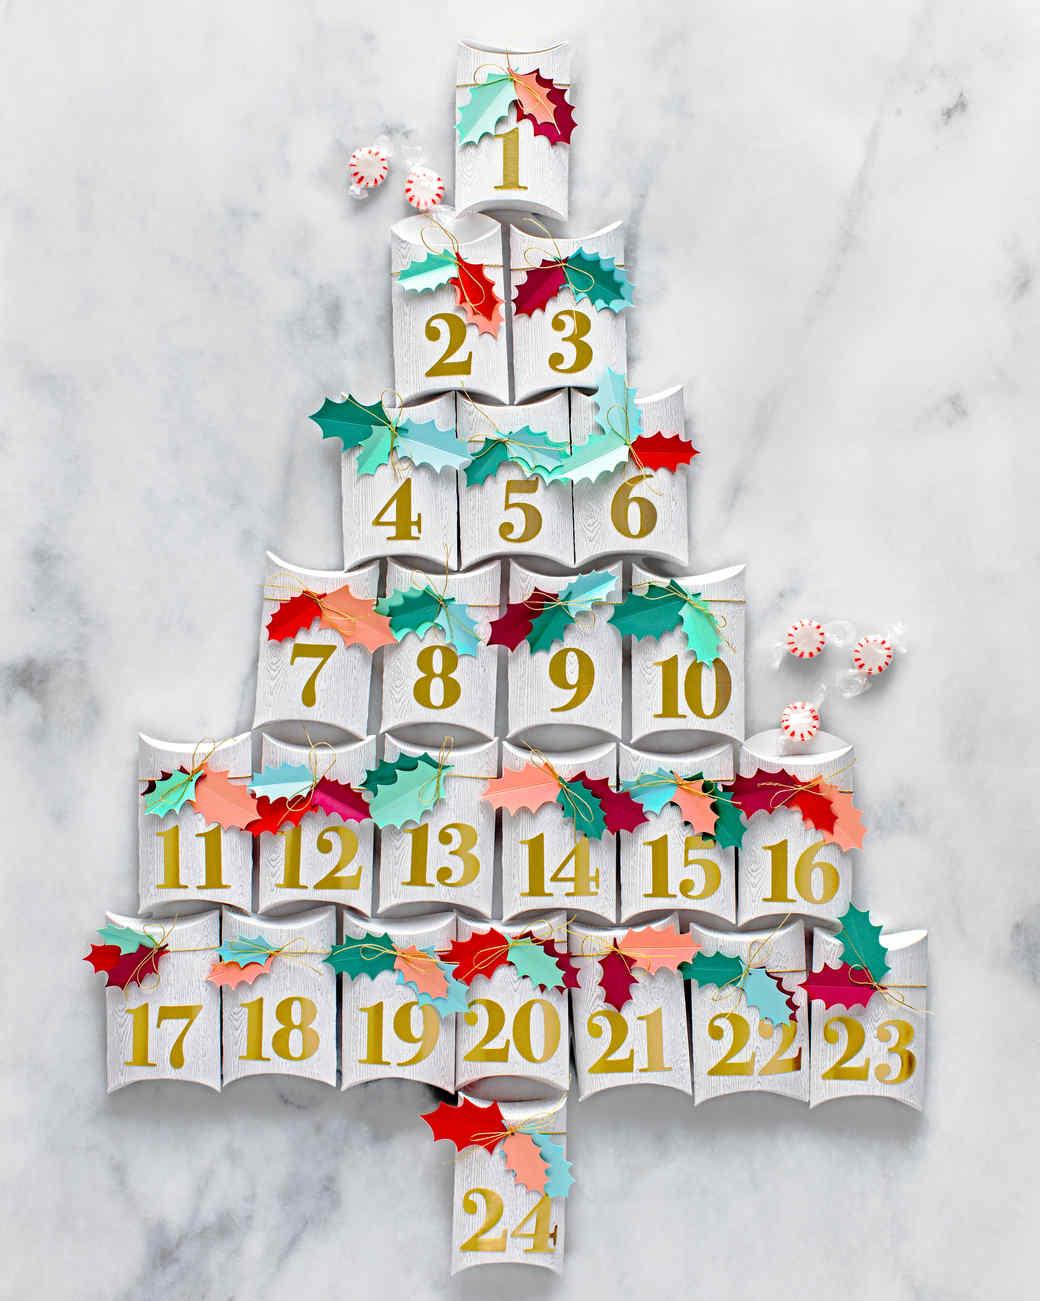 Christmas Calendar Box Wiring Diagrams Liftmaster K001a52514 Garage Door Opener Circuit Board For Lgo Gift Advent Tree Martha Stewart Rh Marthastewart Com 2017